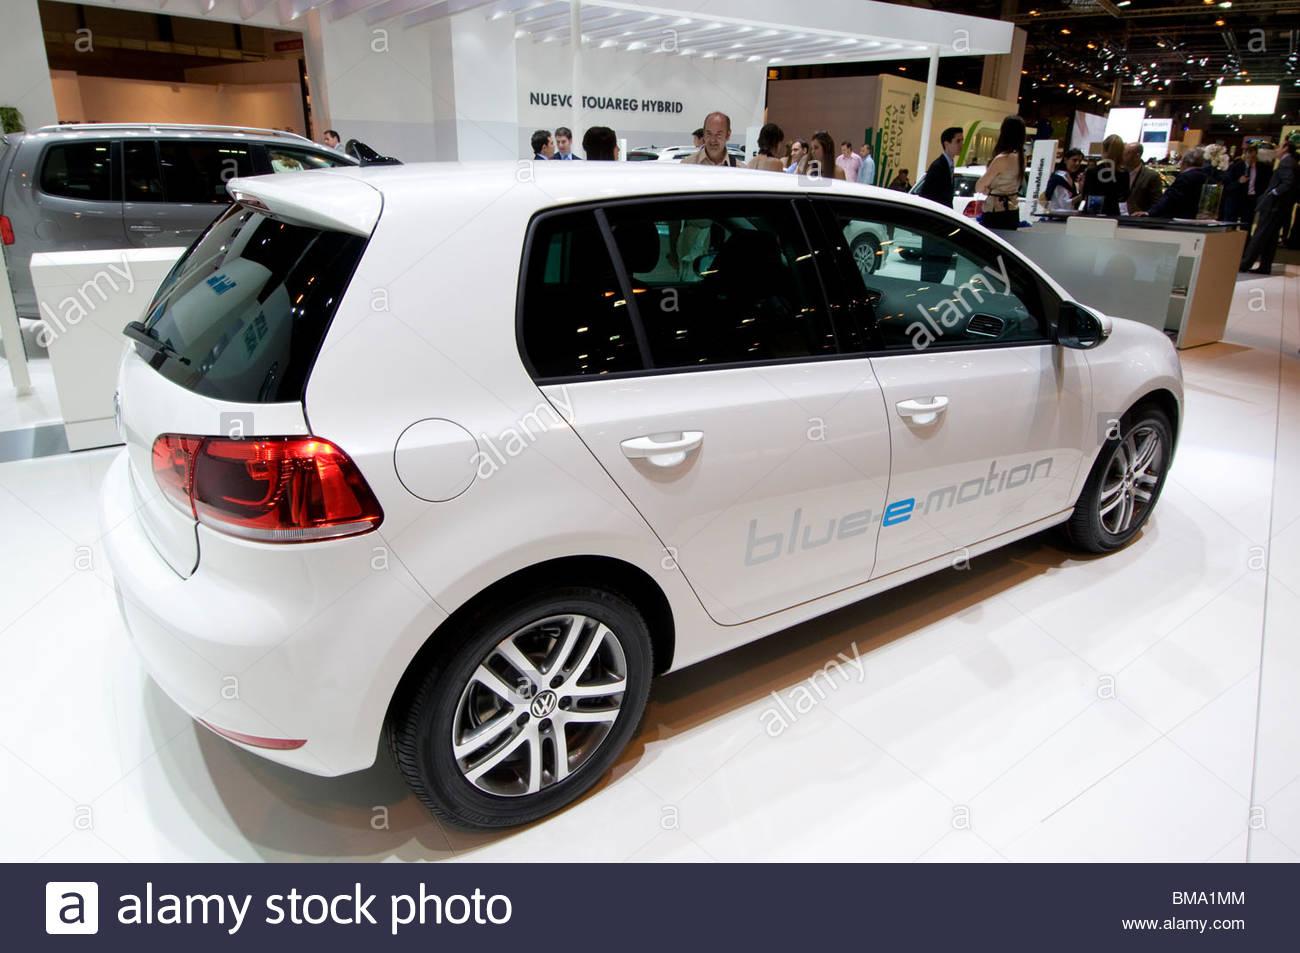 The new VW Golf Blue-e-motion electric car at the Salon Internacional del Automovil Ecologico y de la Movilidad - Stock Image